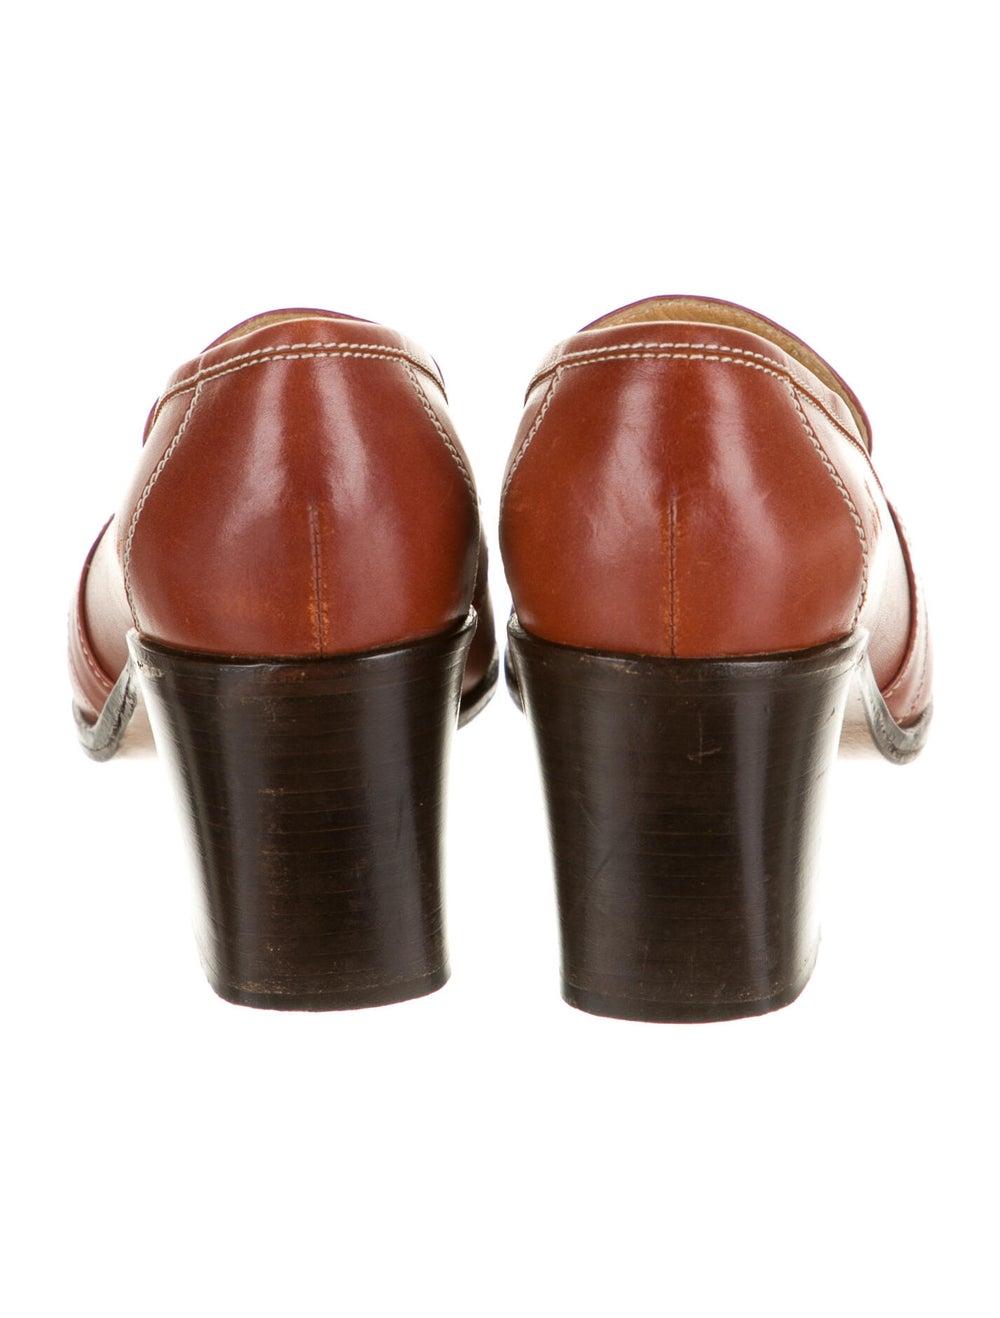 Hermès Vintage Leather Pumps - image 4